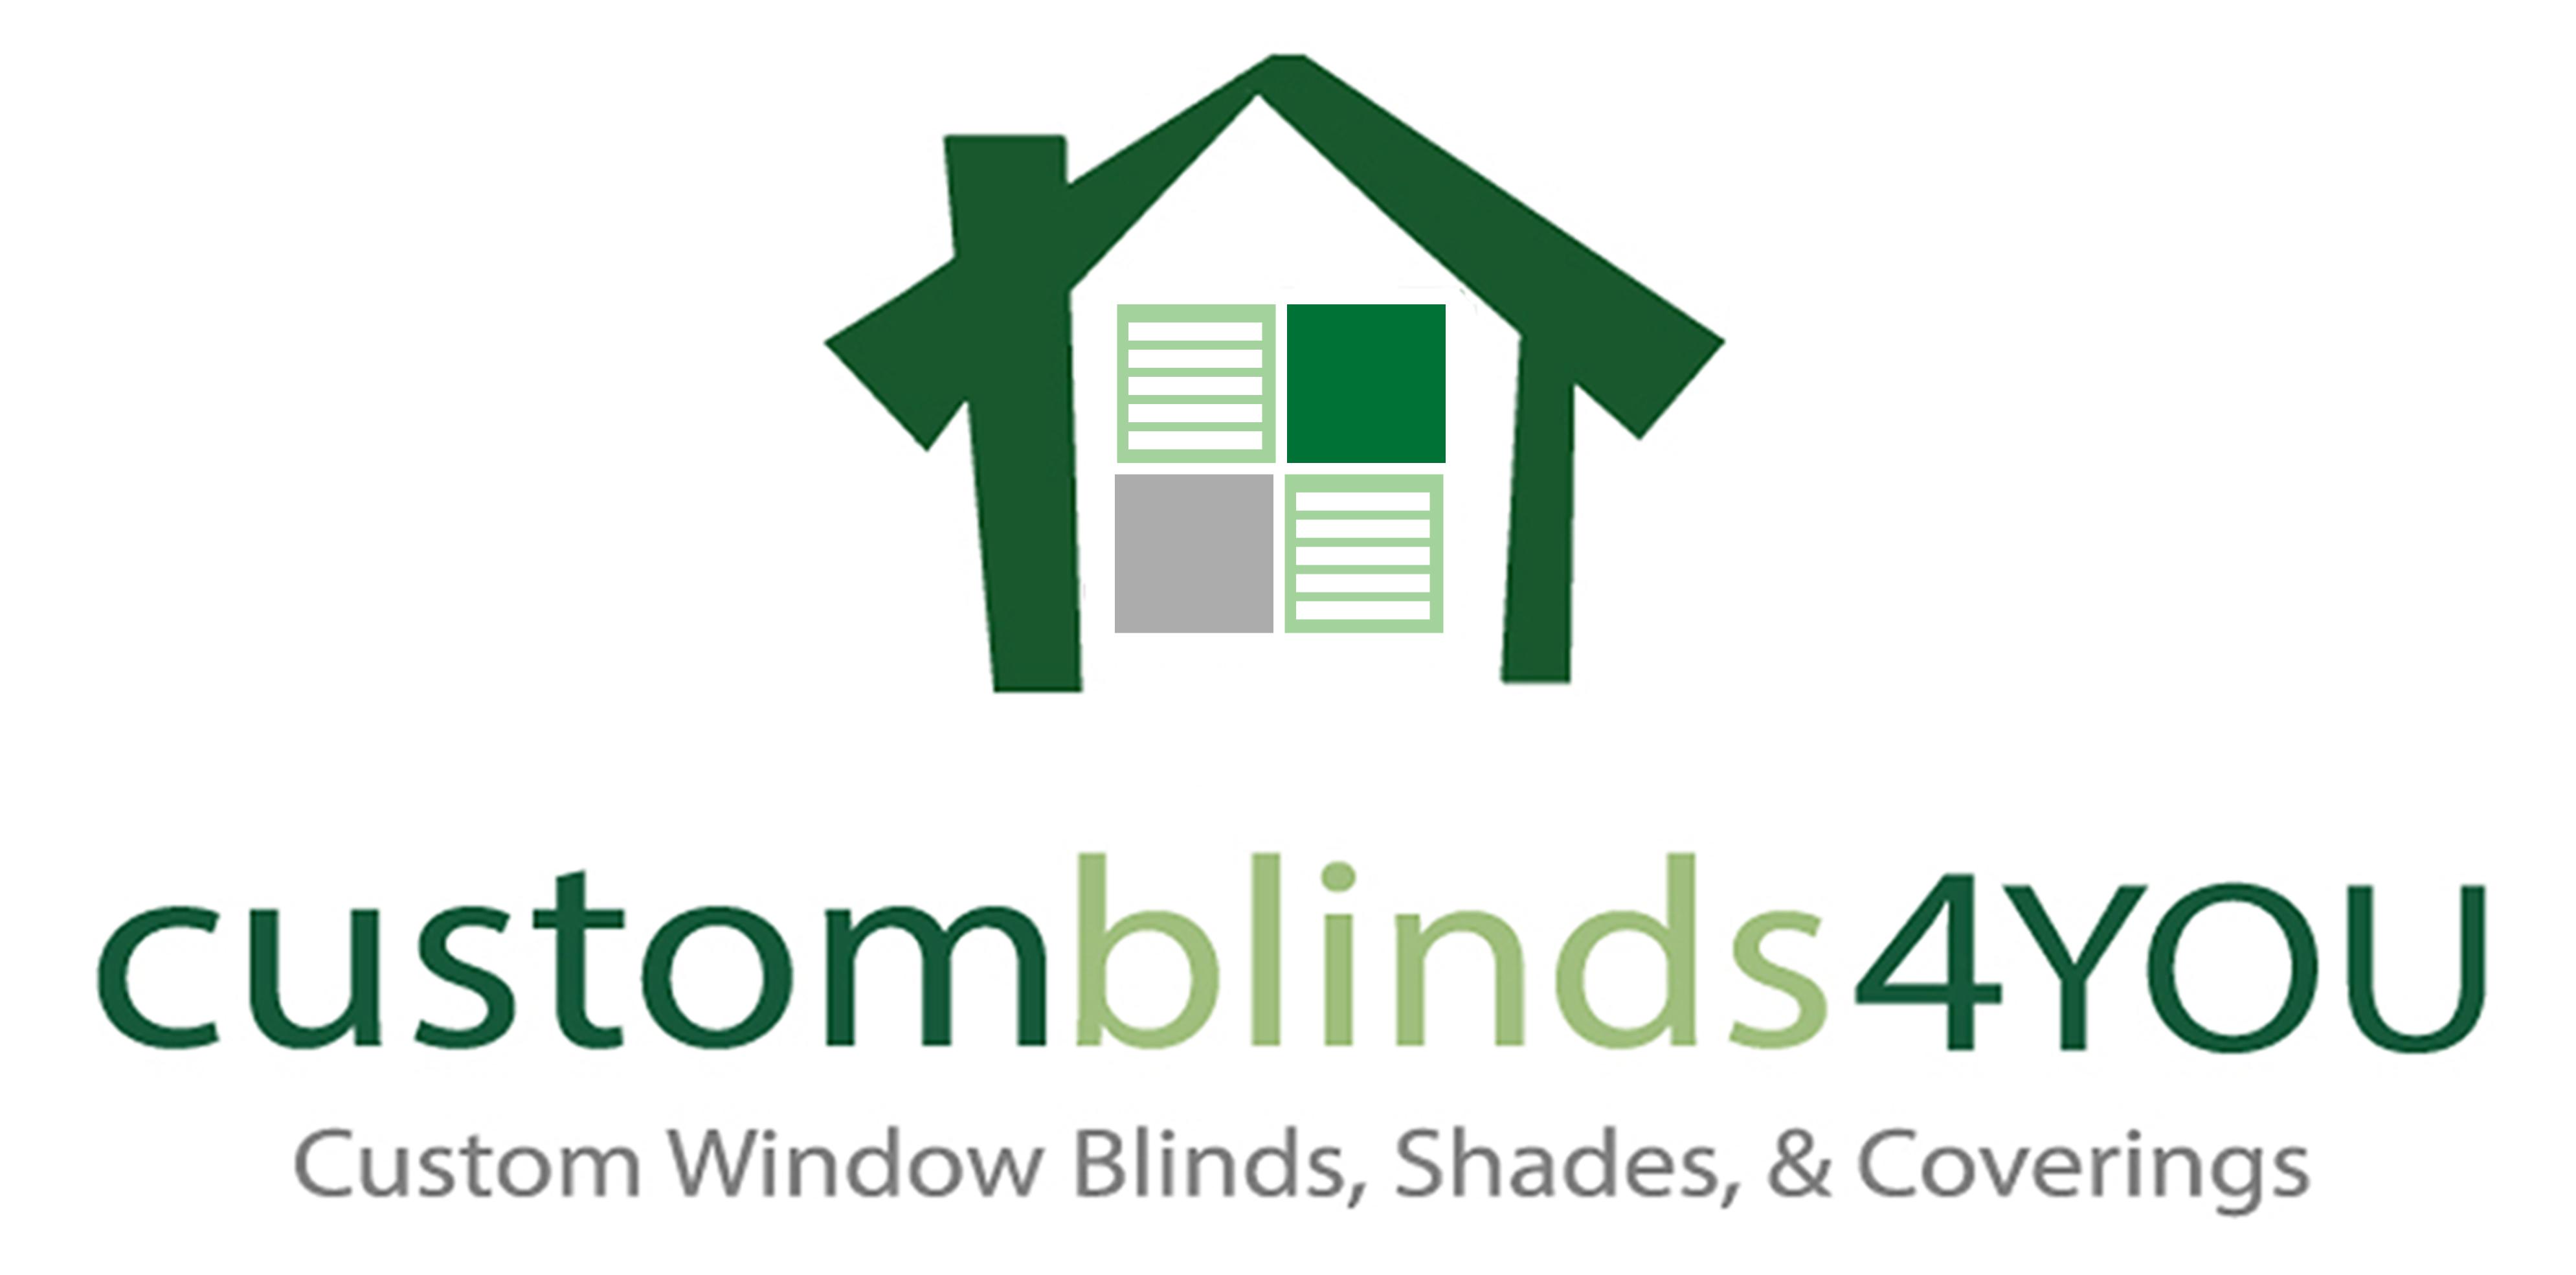 A New Custom Blinds 4 You